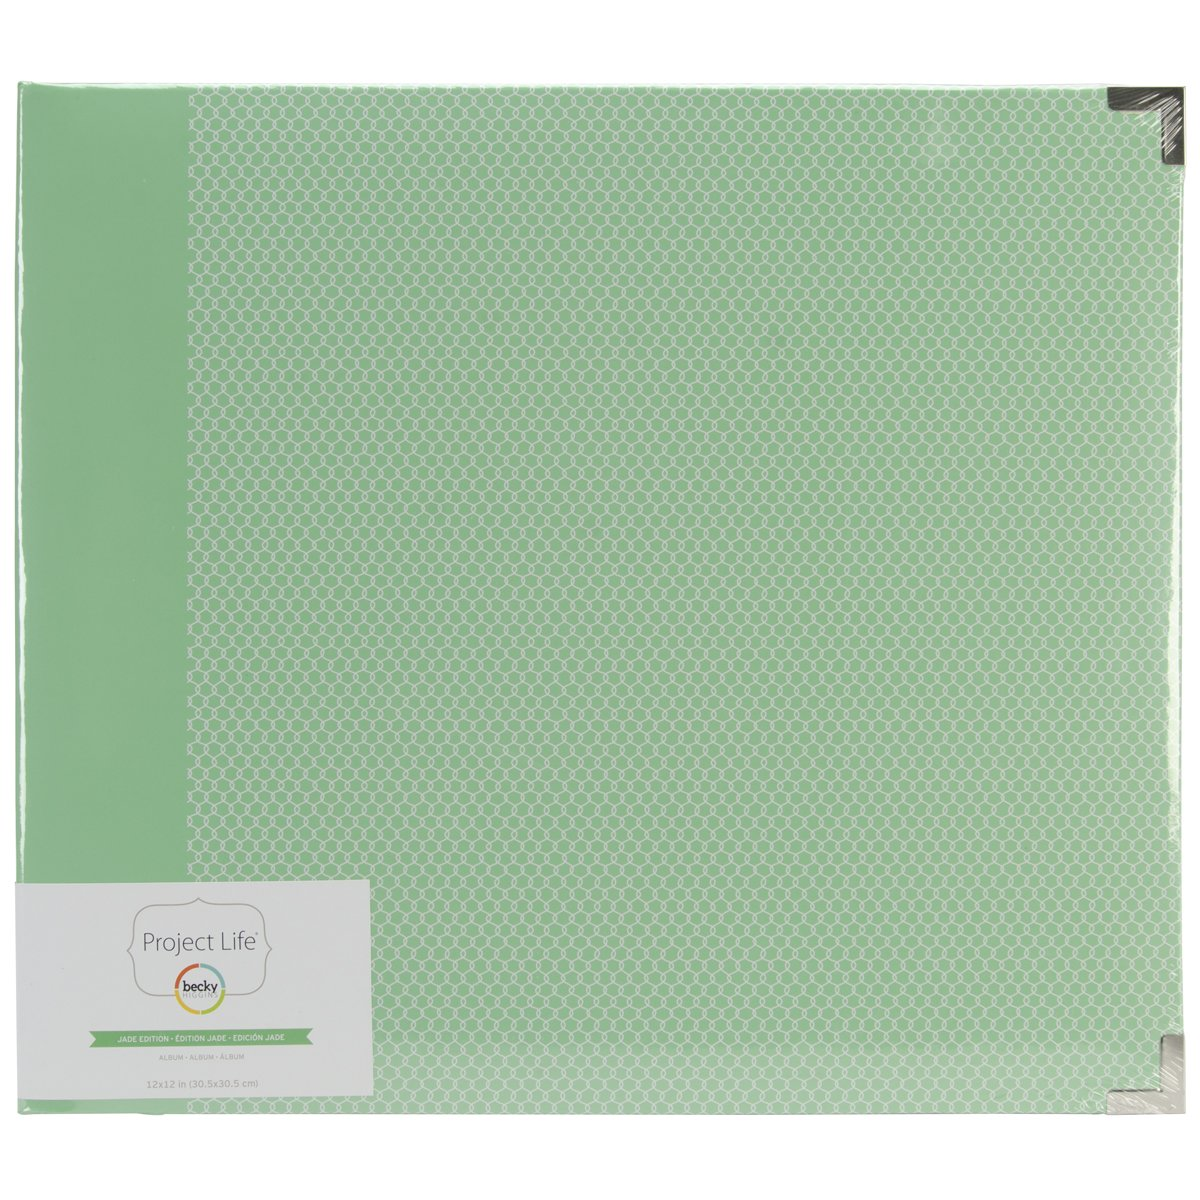 American Crafts Project Life D-Ring Album, Multi-Colour, 38.1 x 33.65 x 6.98 cm PL380053